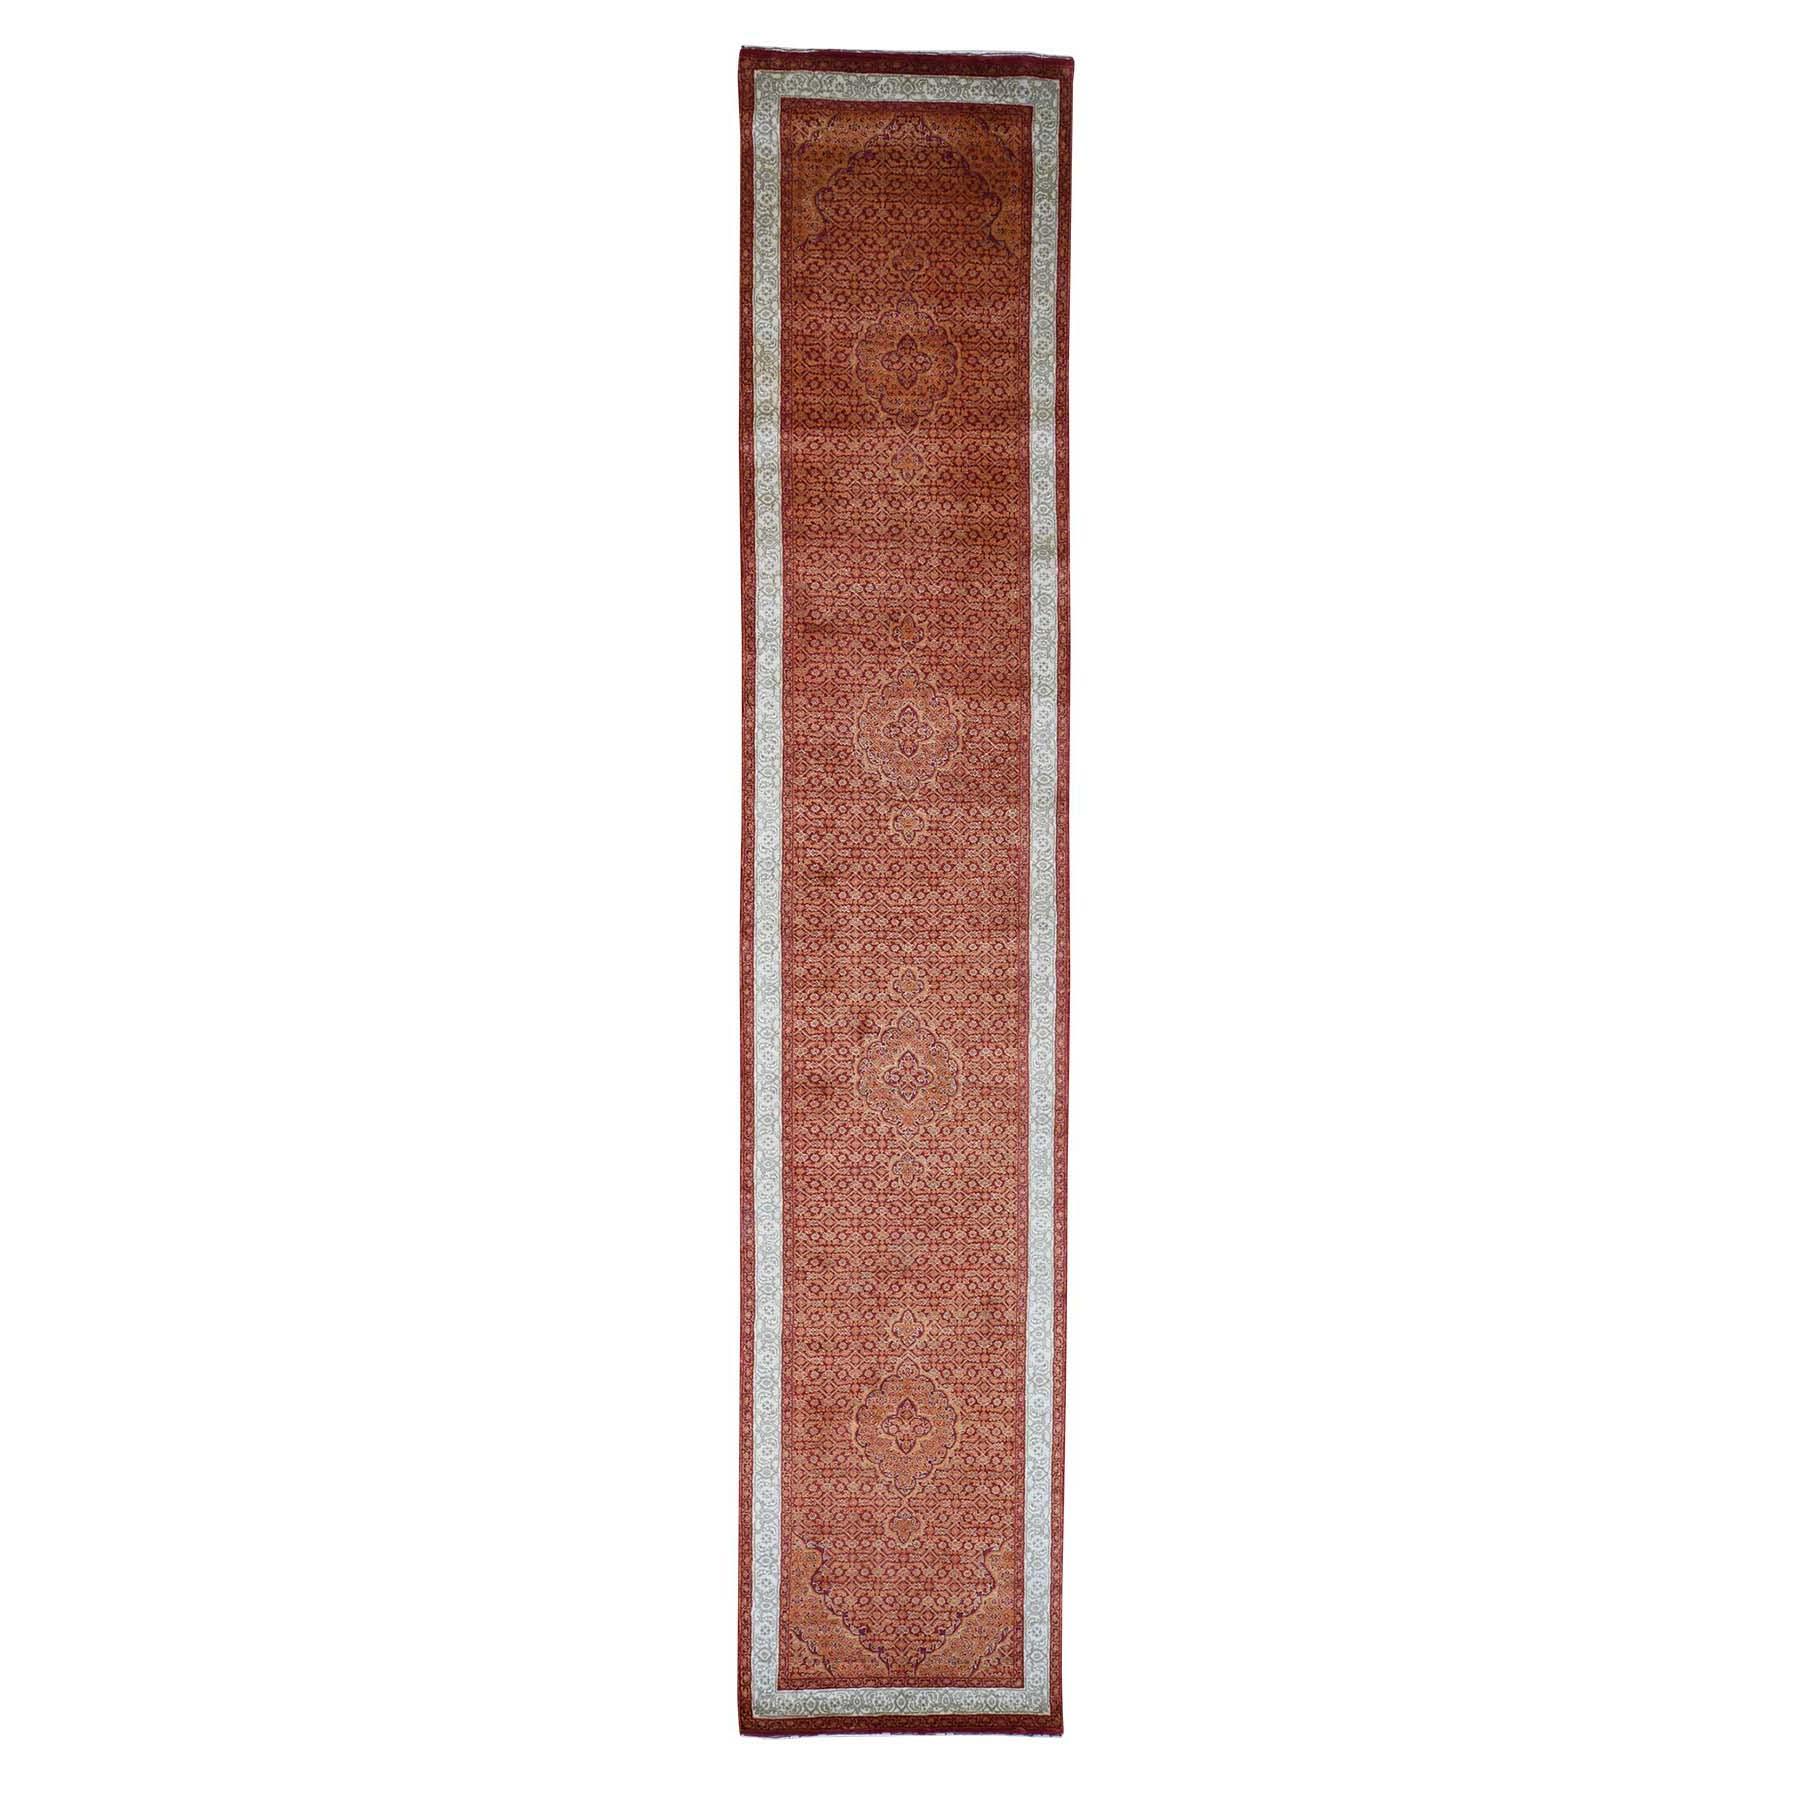 2-9 x14- Tabriz XL Runner Wool And Silk Hand Knotted Oriental Rug